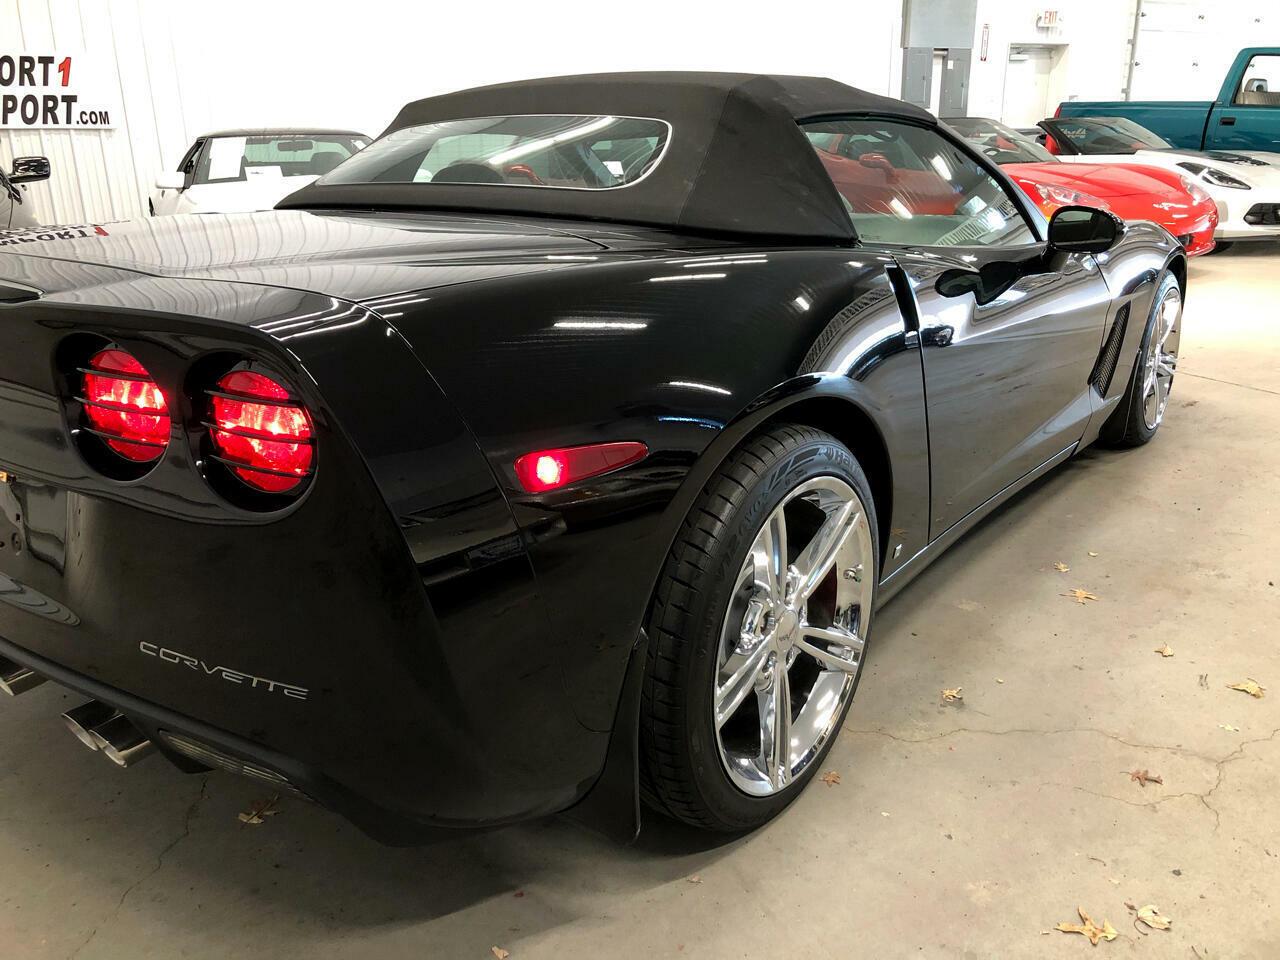 2007 Black Chevrolet Corvette Convertible    C6 Corvette Photo 3